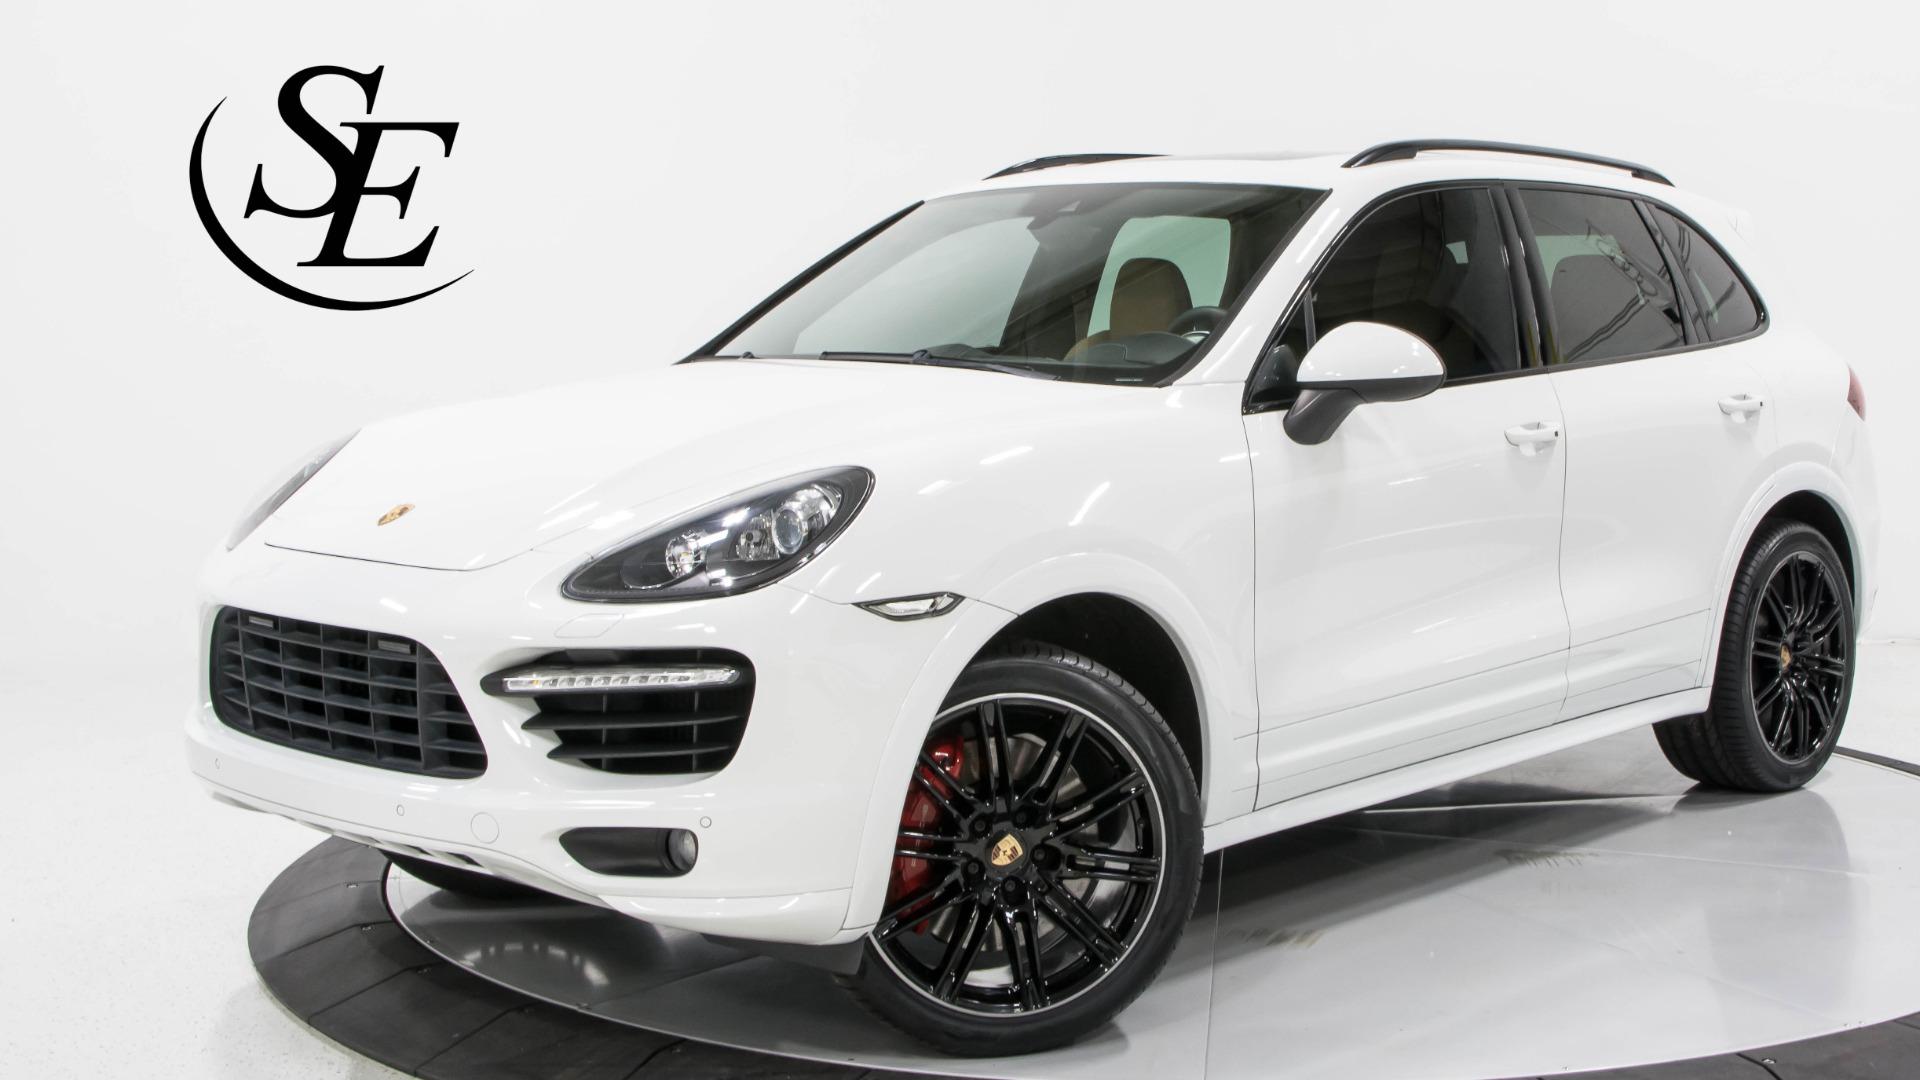 2014 Porsche Cayenne Turbo Stock 22545 For Sale Near Pompano Beach Fl Fl Porsche Dealer